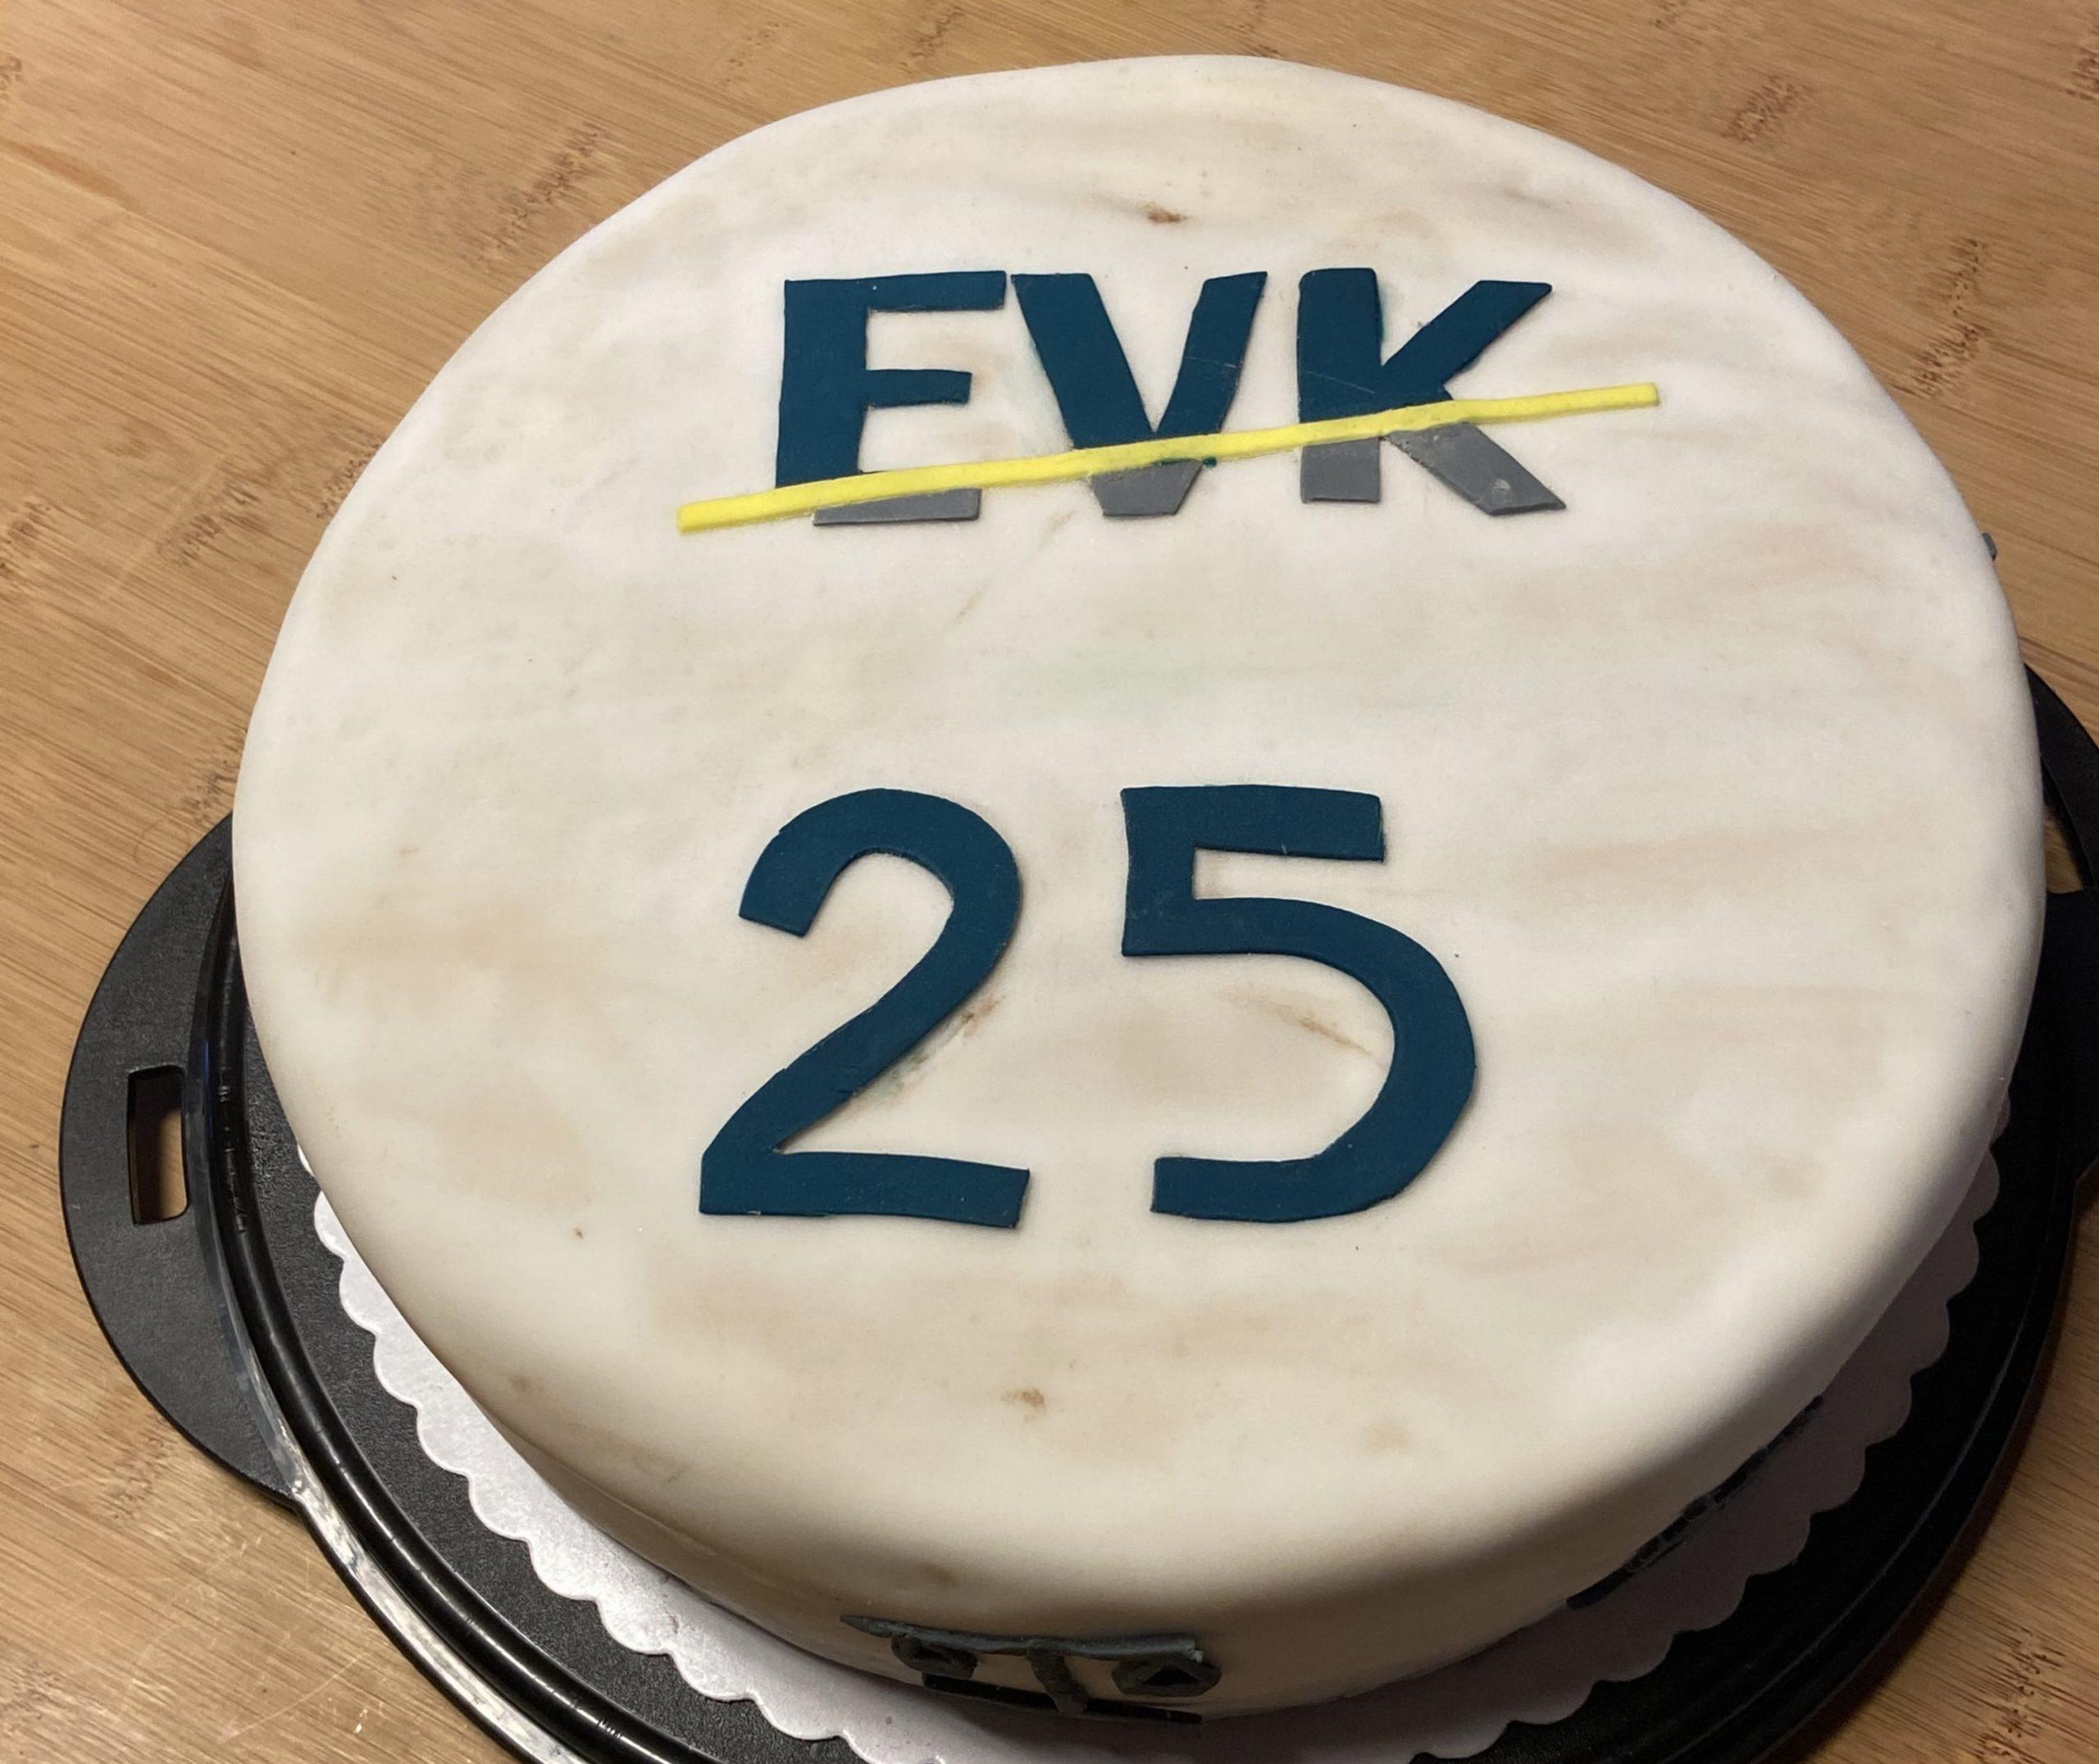 Torte zum Firmenjubiläum EVK